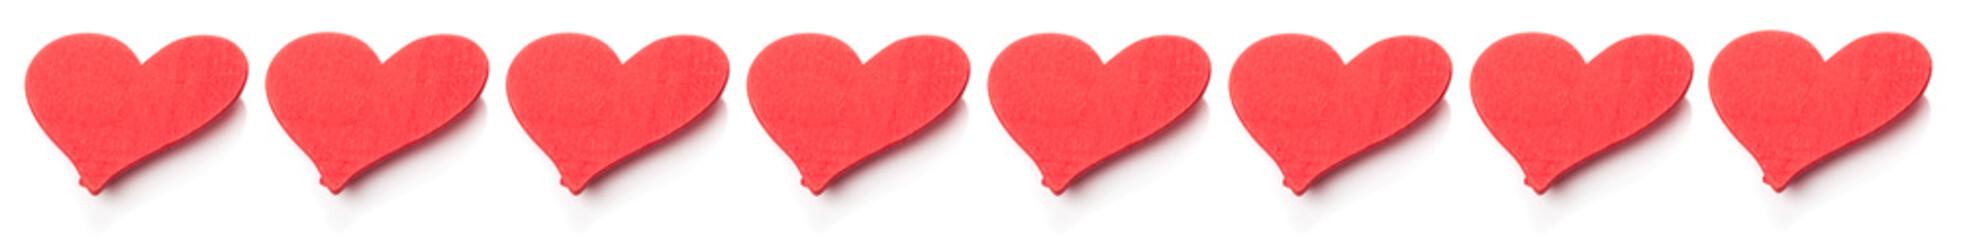 Rote Herzen, Reihe